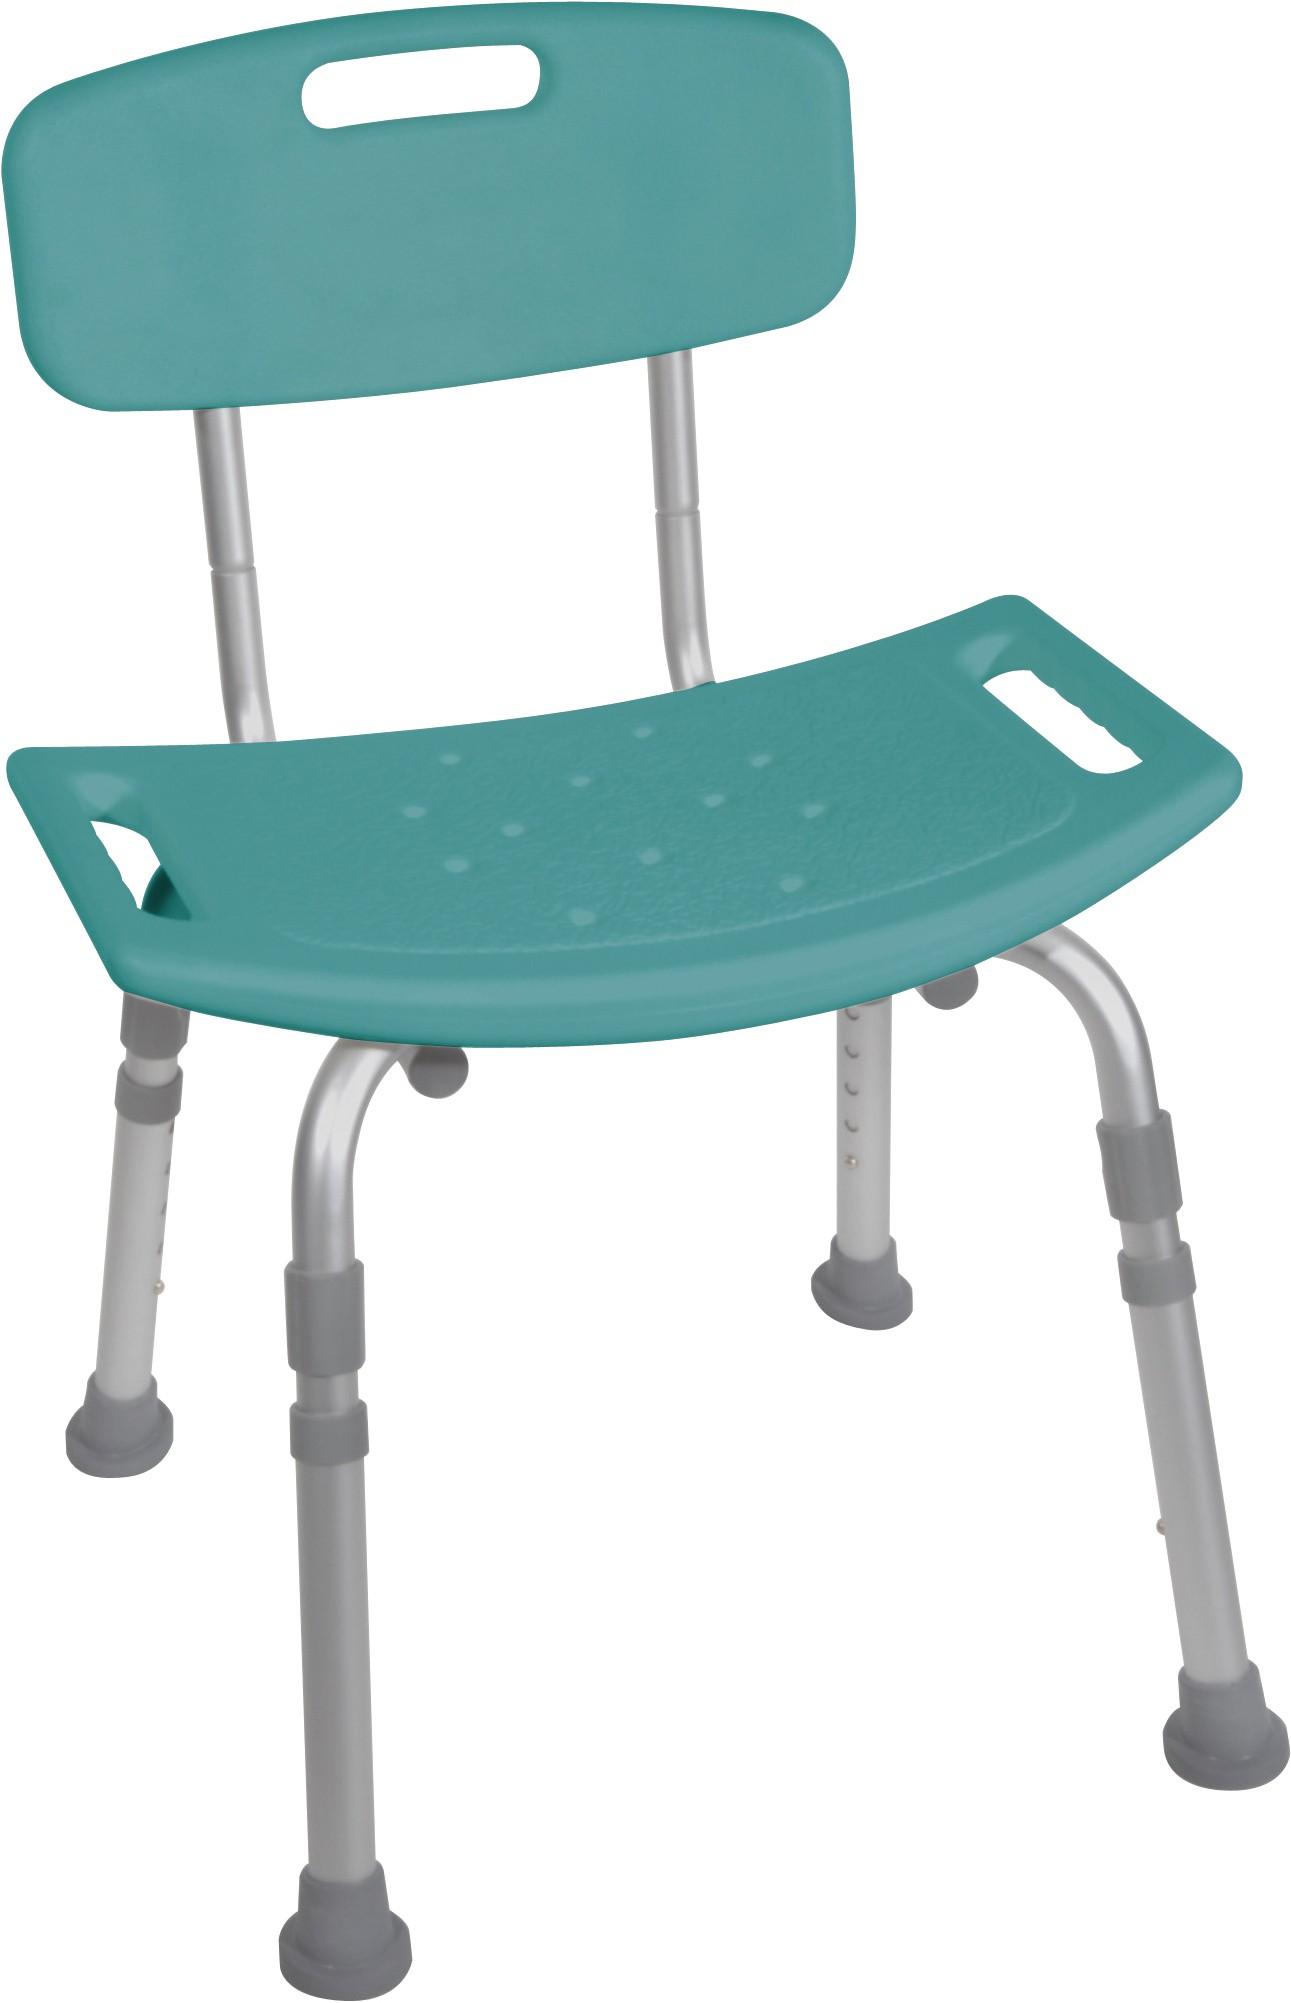 bathroom_safety_shower_tub_bench_chair_green.jpg